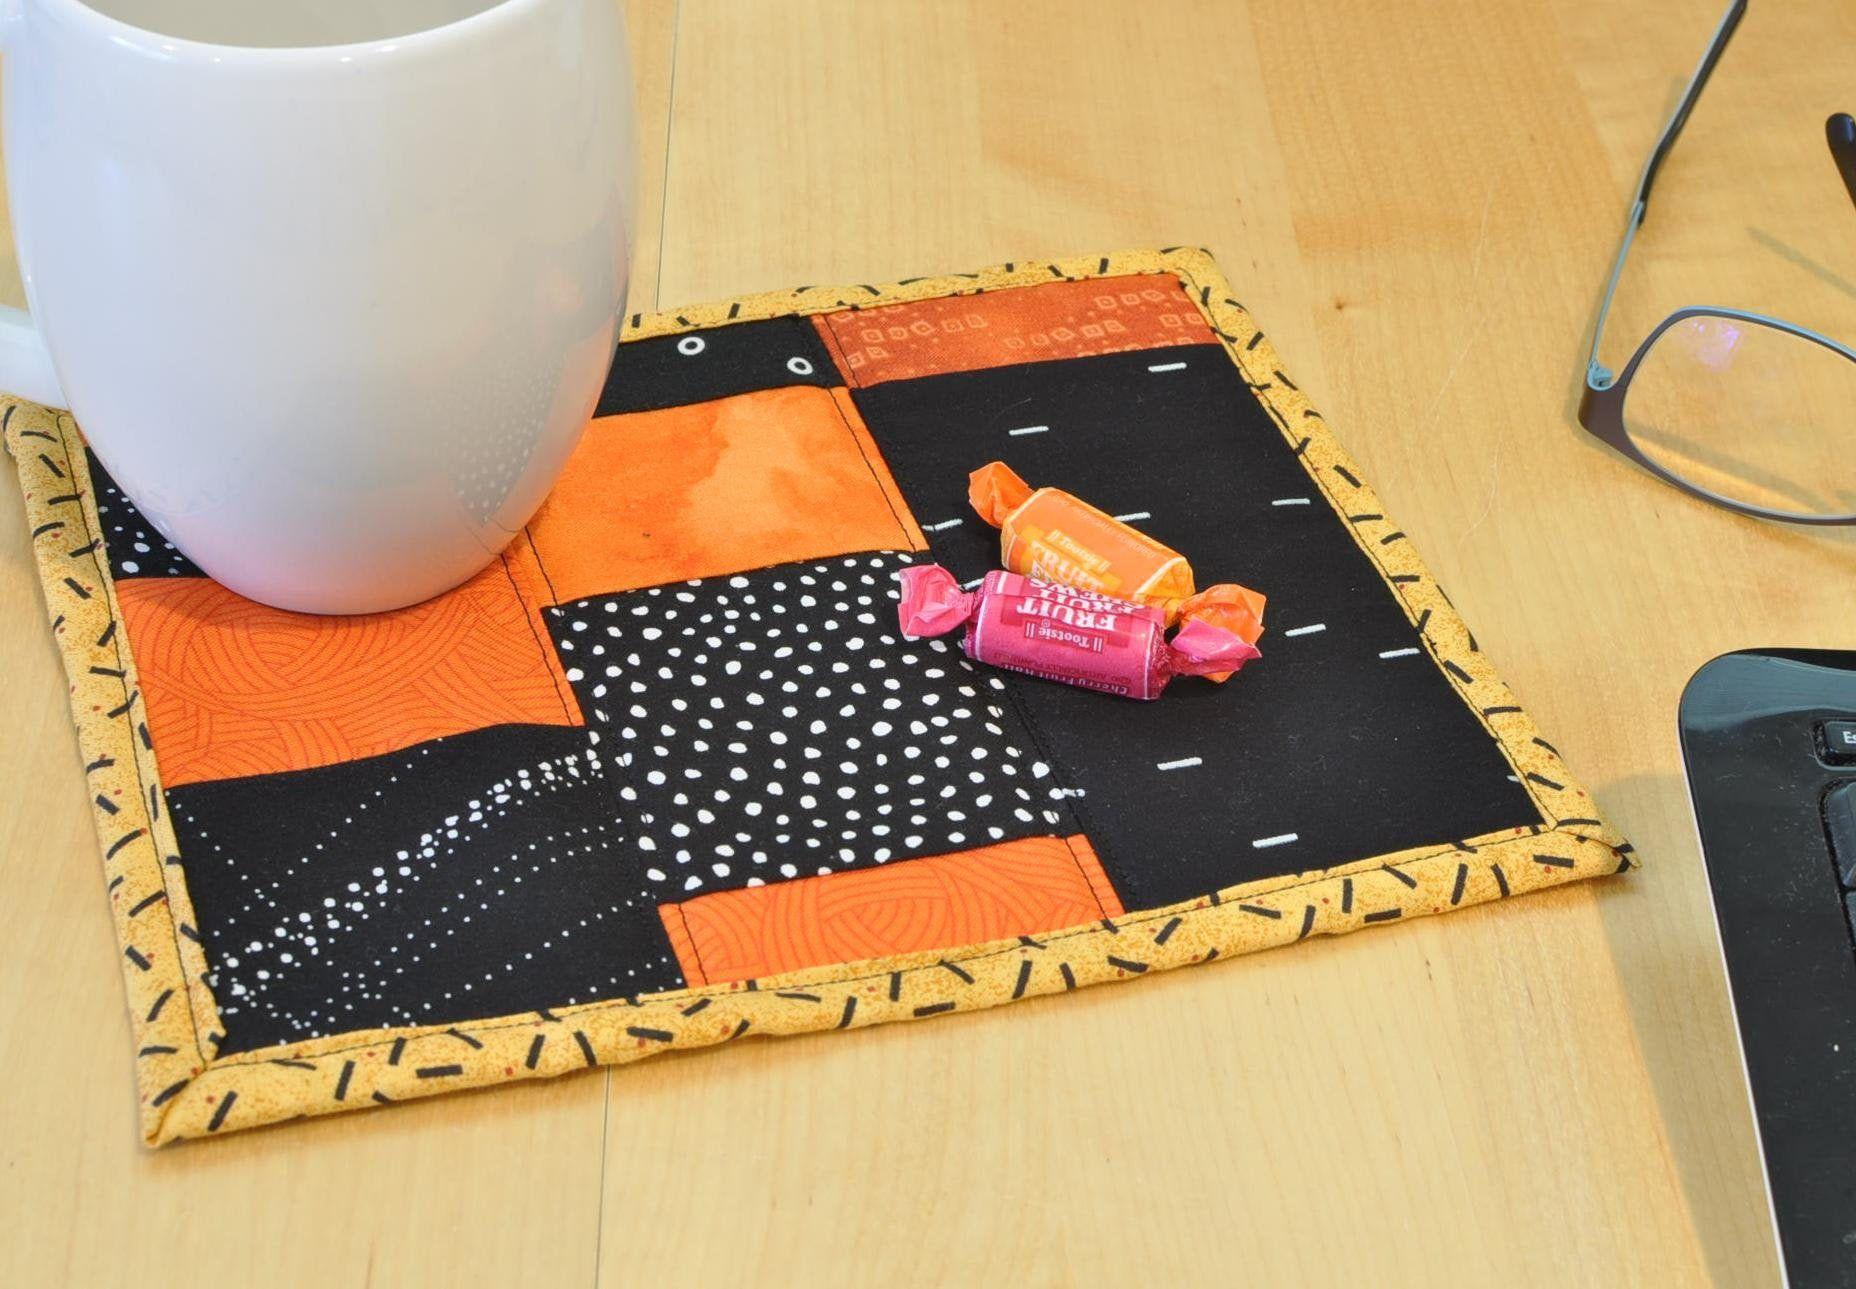 Mug Rug Reusable Snack Mat Mini Quilt Home Decor Desk Accessory Large Fabric Coaster Candle Mat Orange Black 45 In 2020 Mug Rug Mini Quilt Handmade